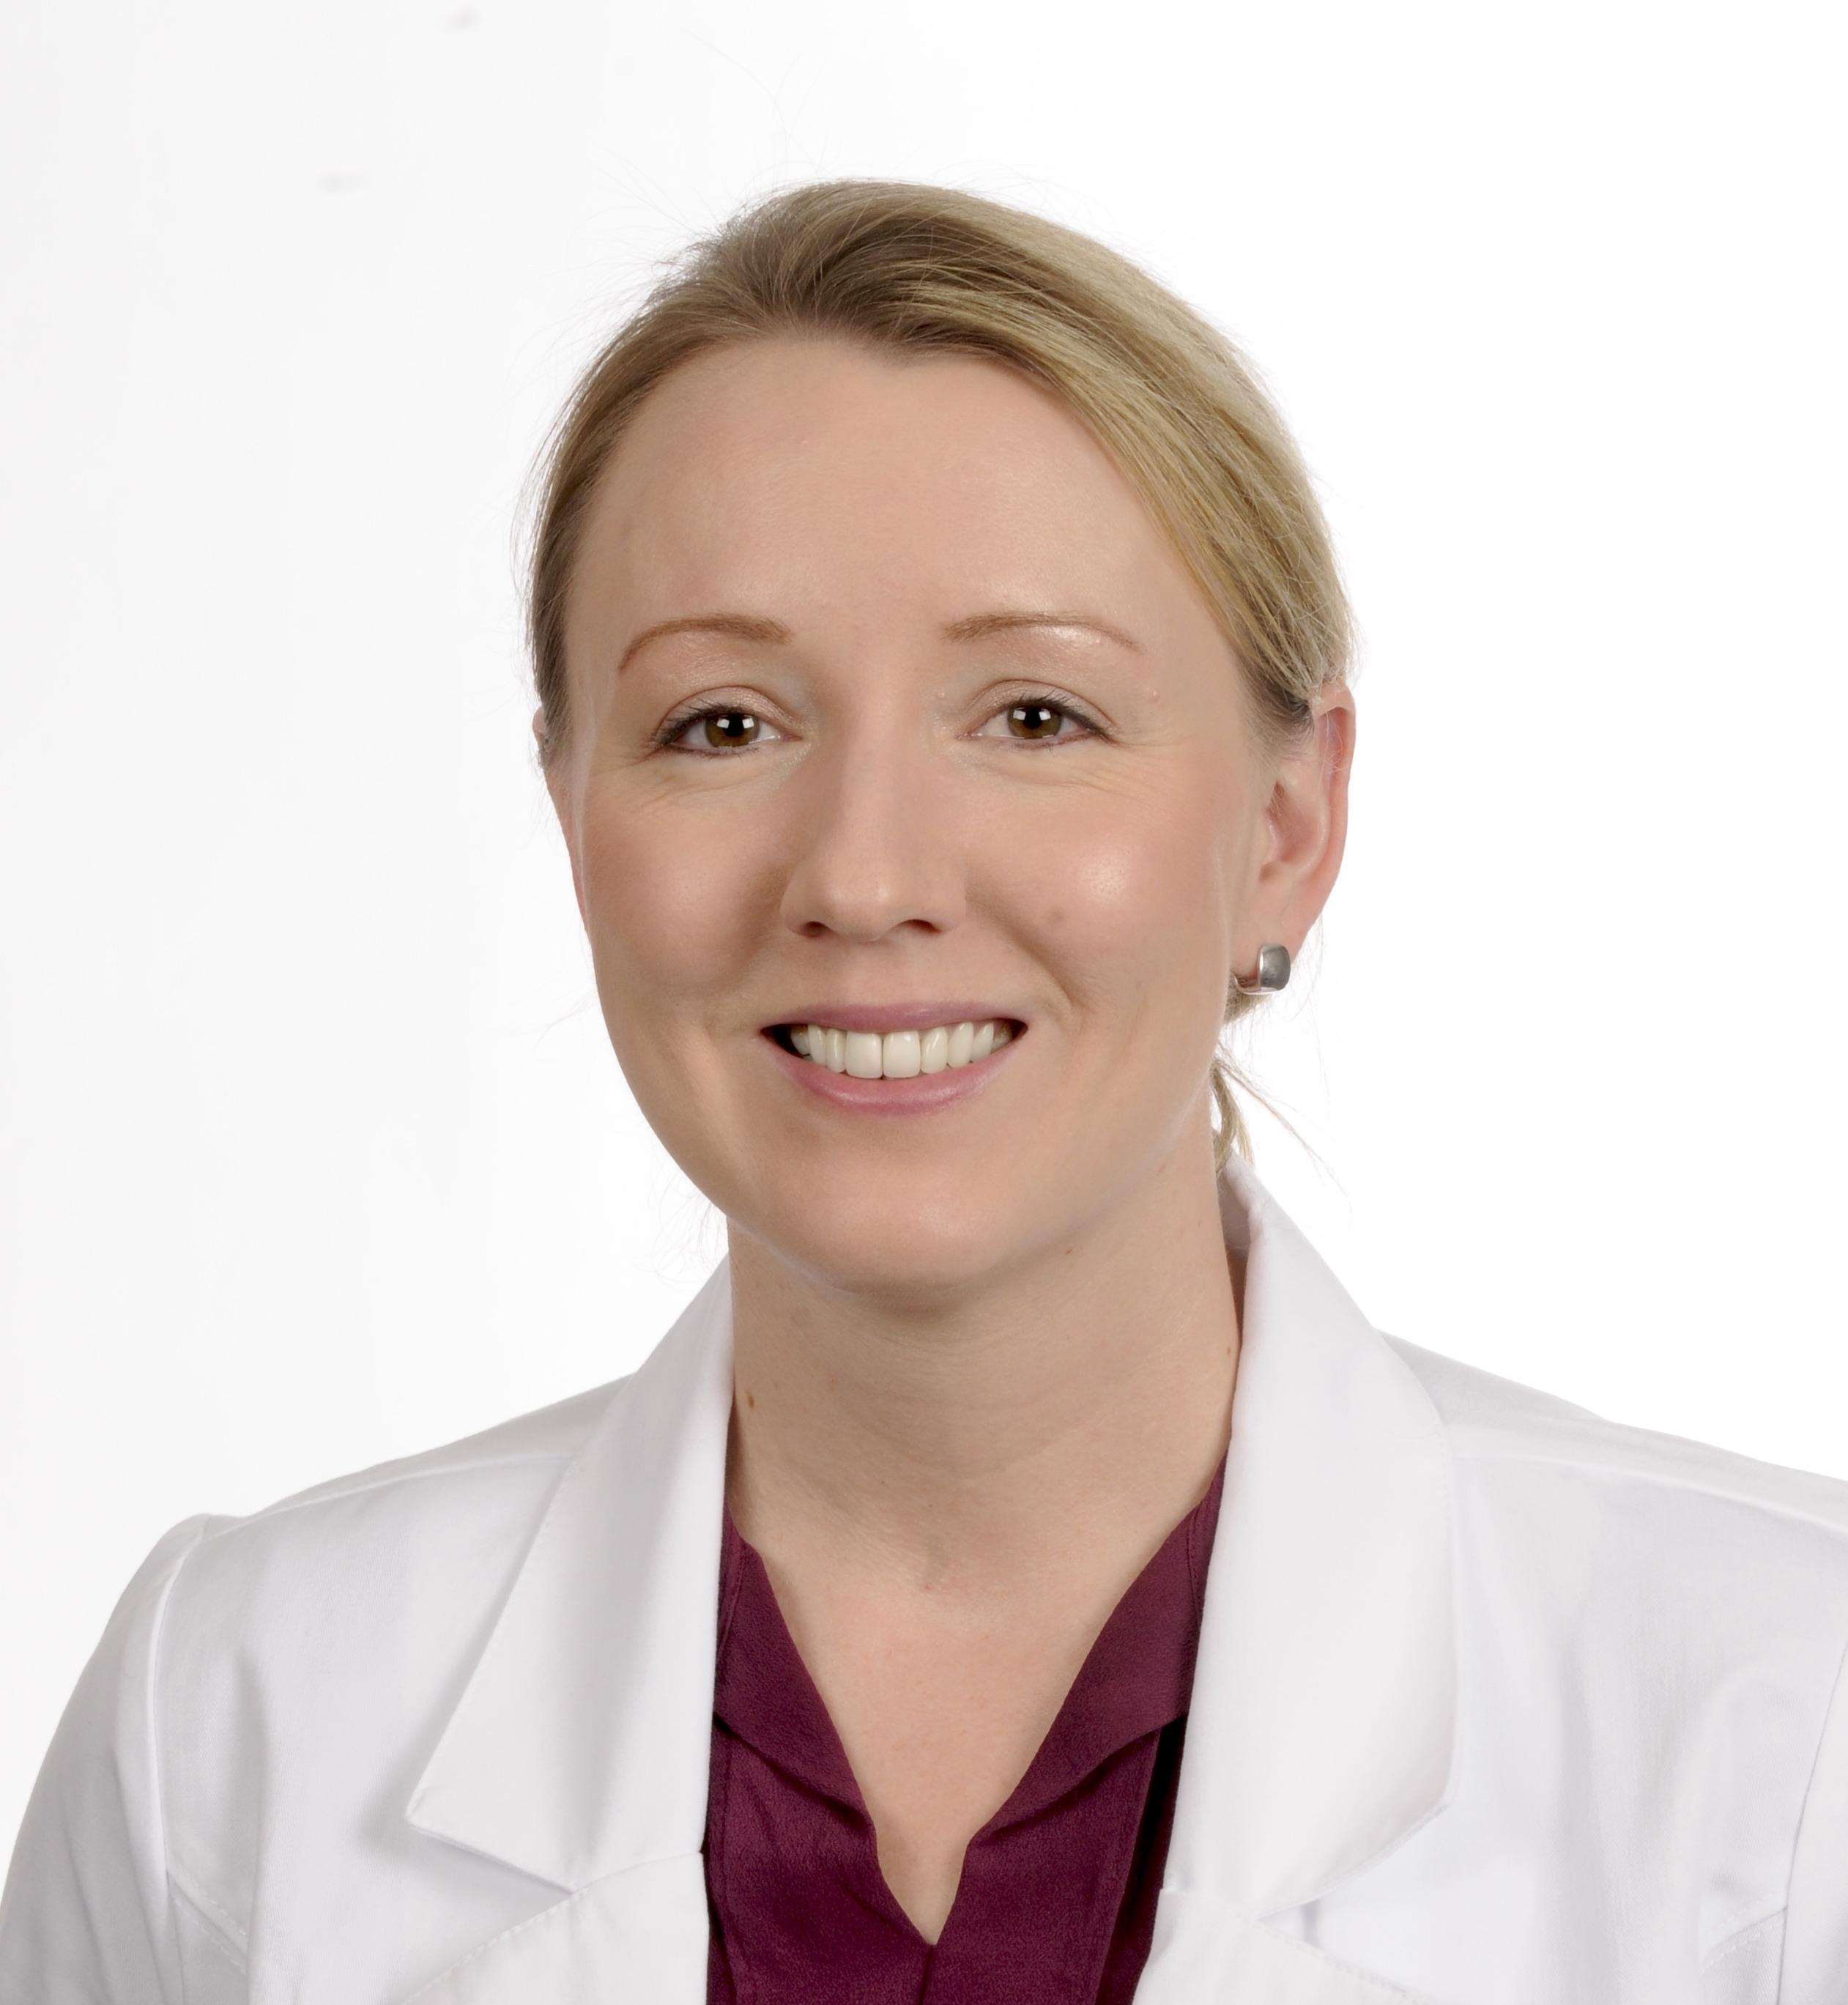 Felicia D. Allard, M.D.